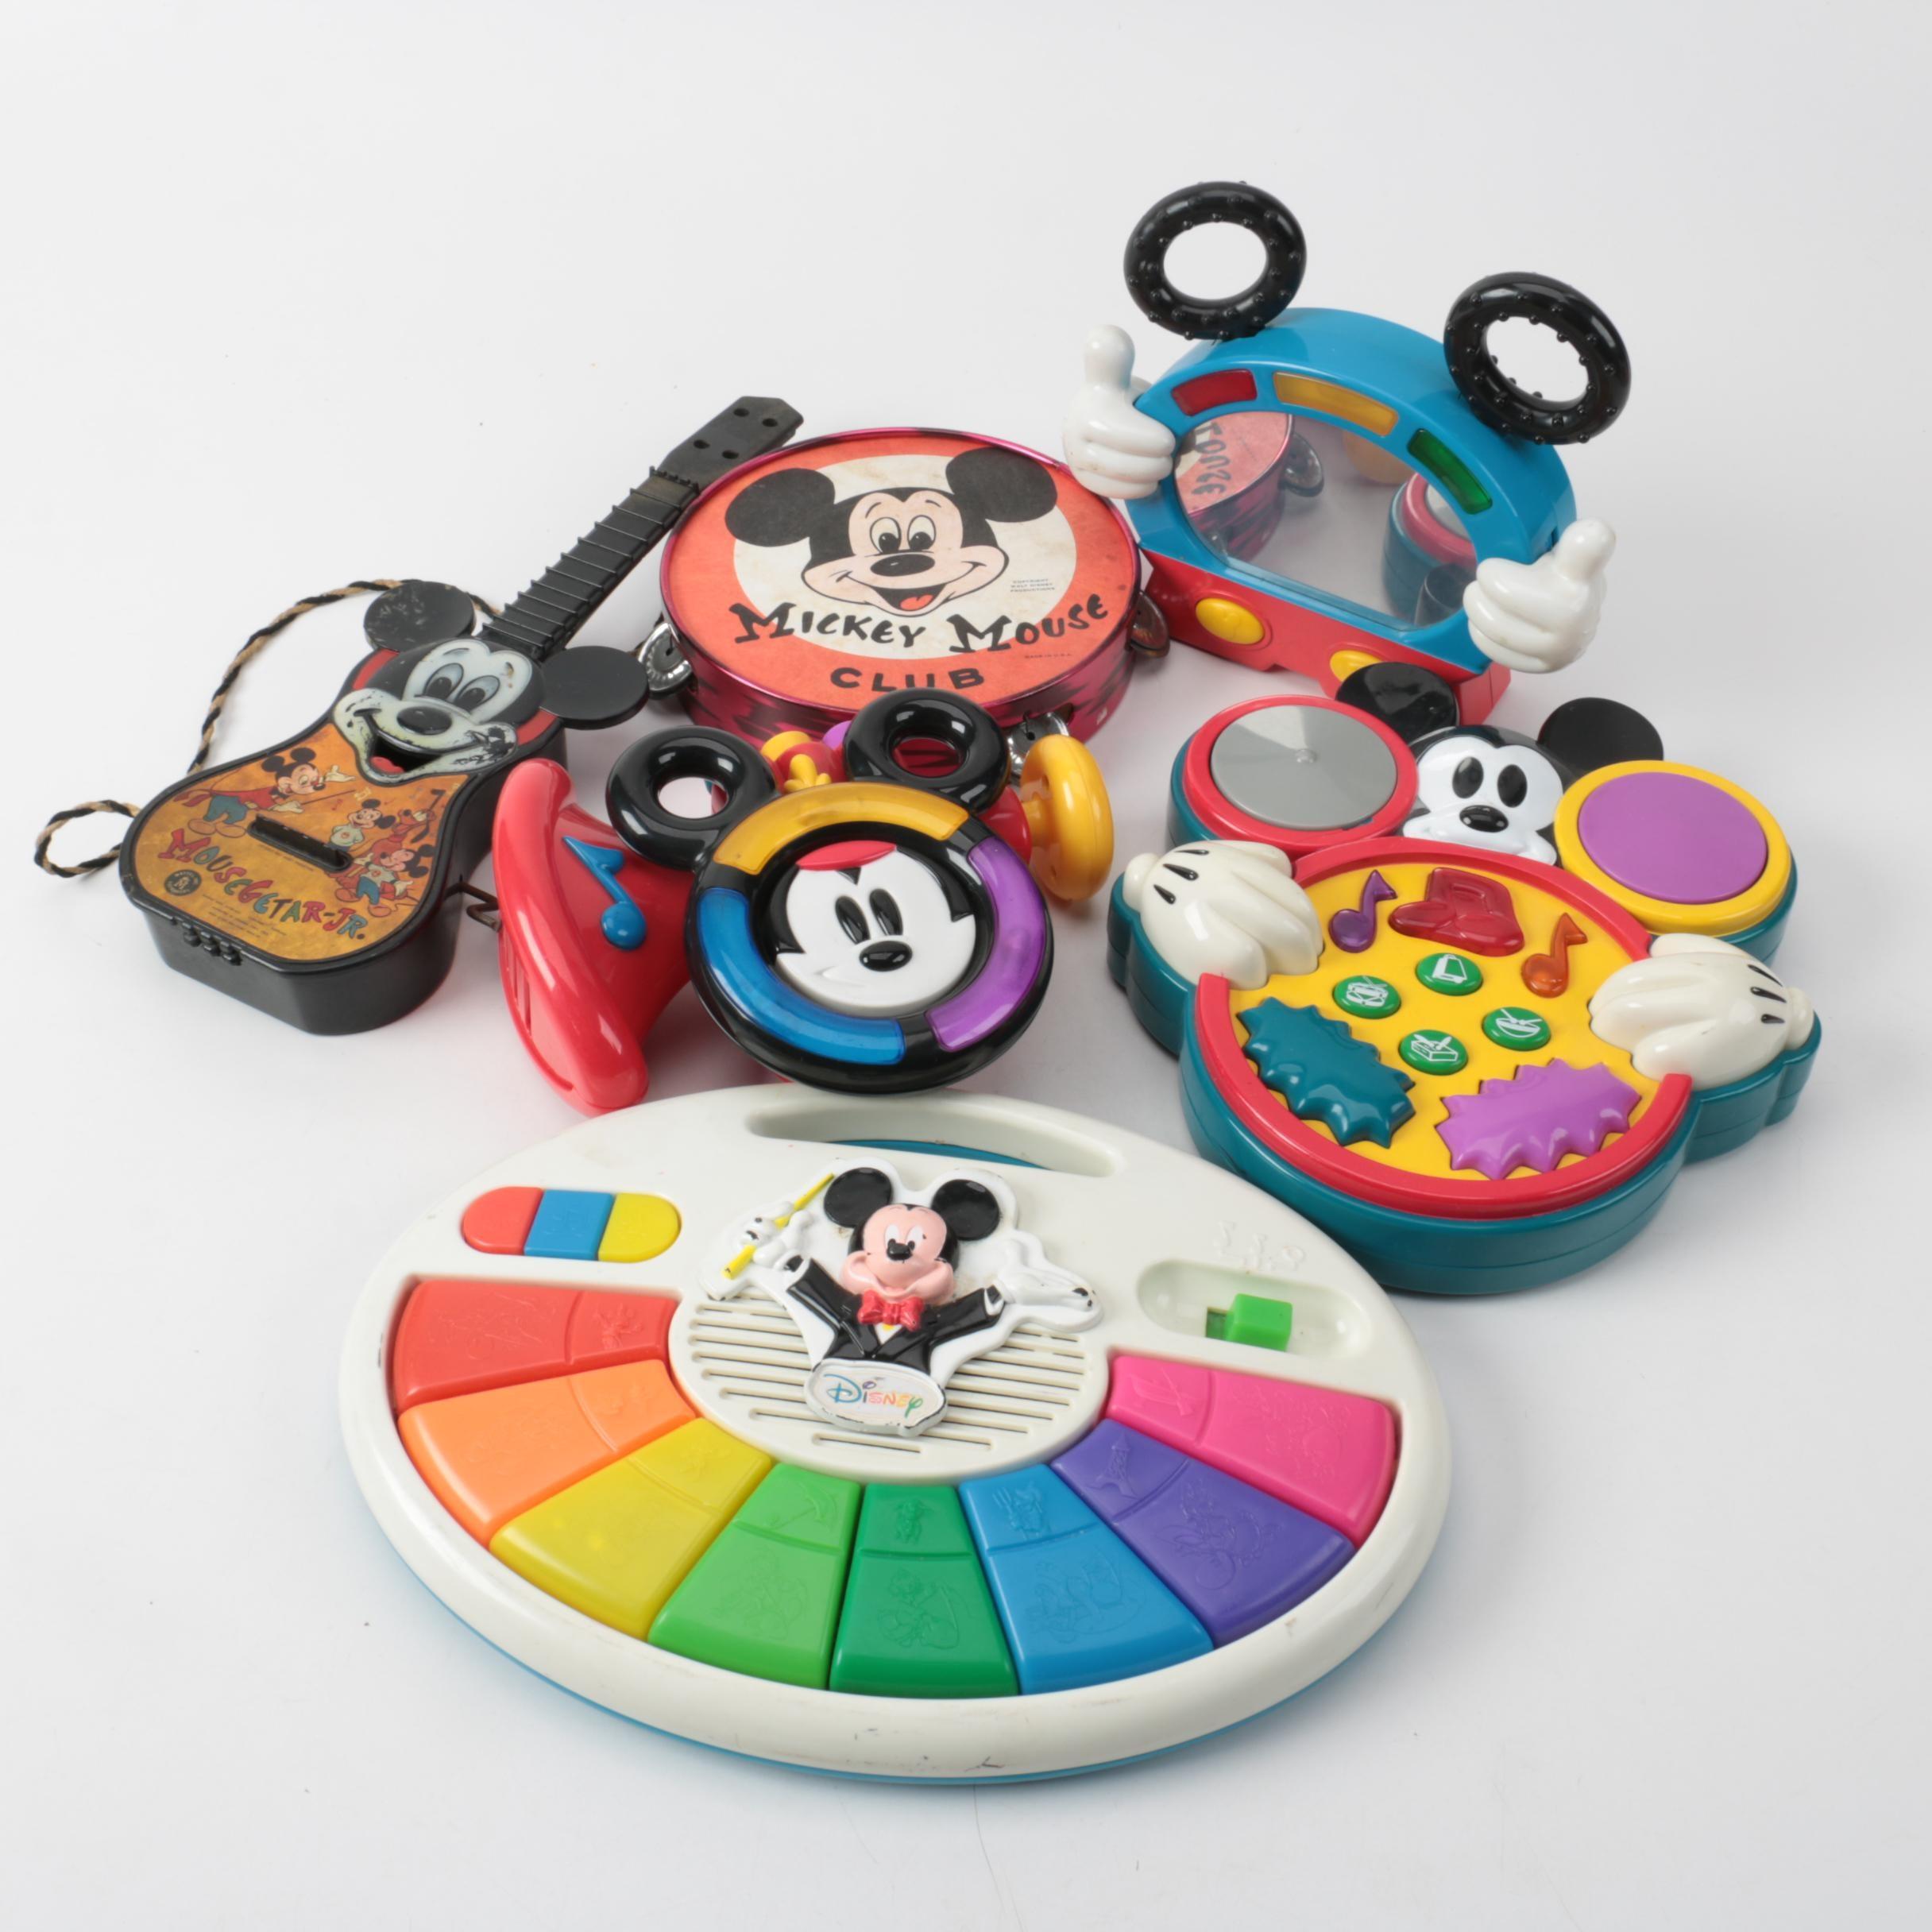 Disney Mickey Mouse Children's Toys